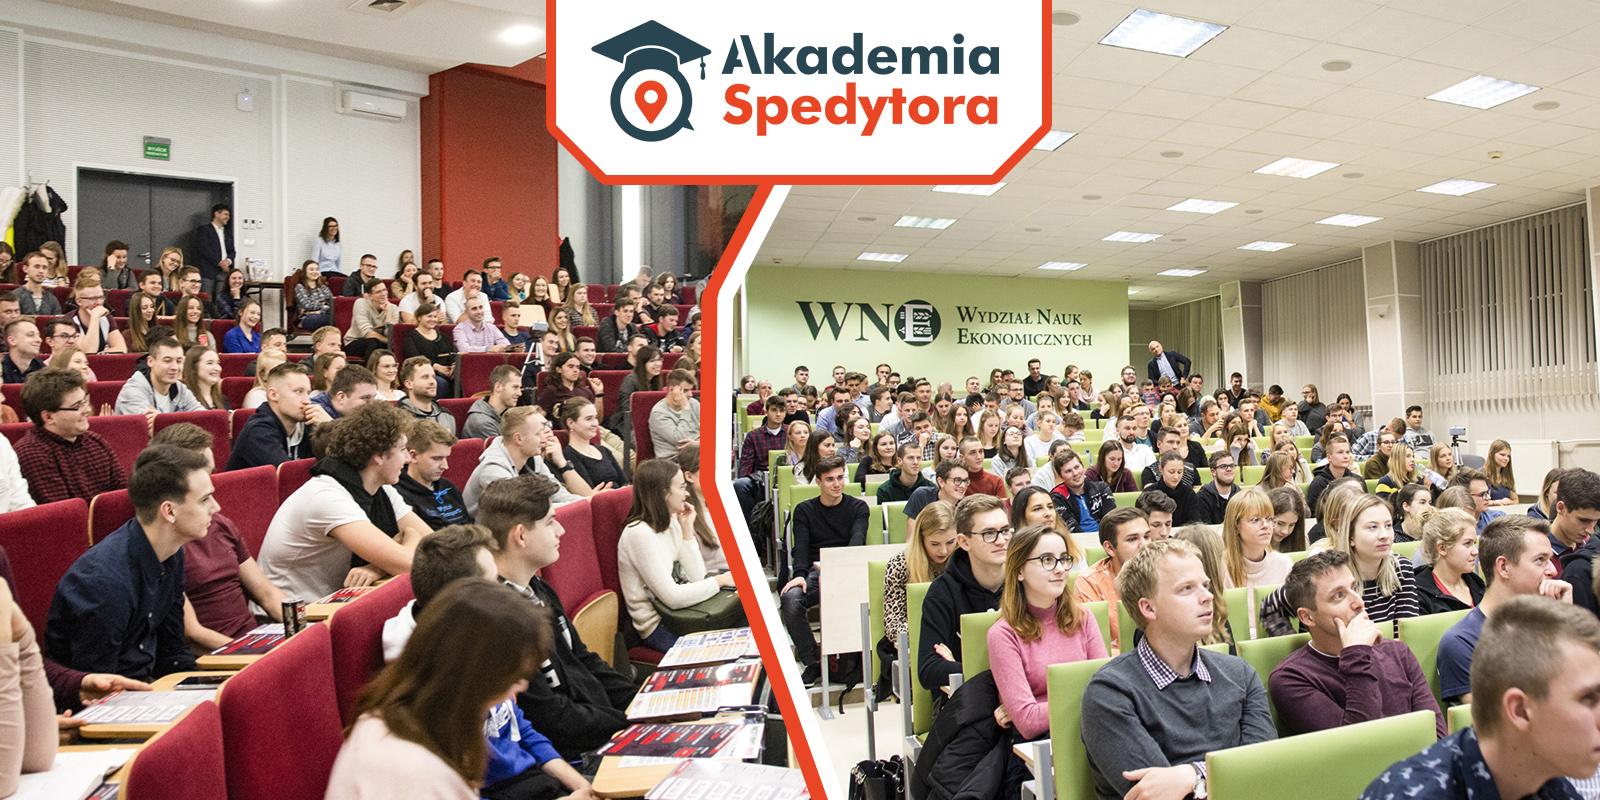 Akademia Spedytora